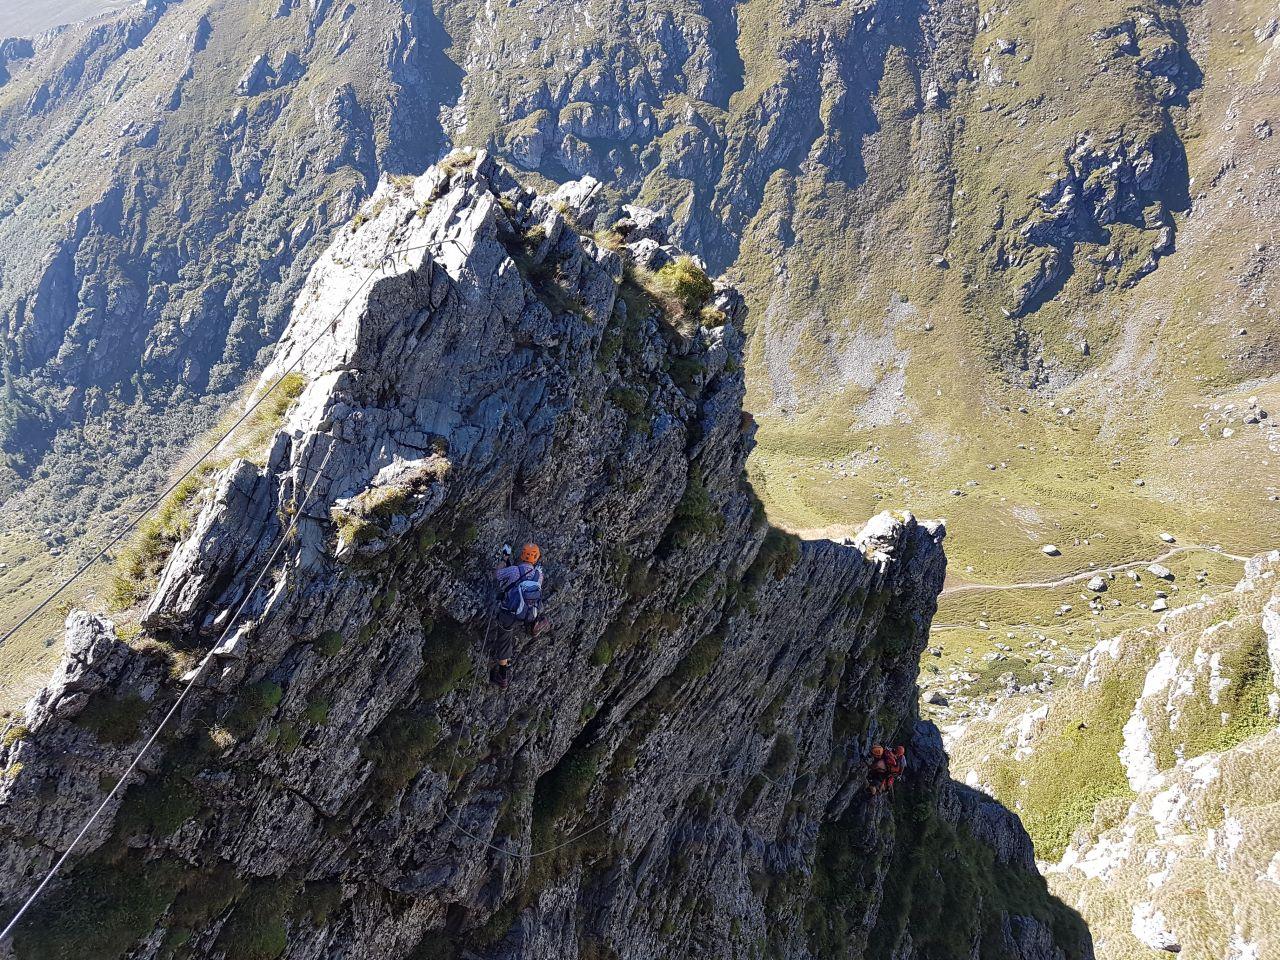 Klettersteig Falkert : Wandern falken klettersteig auf den falkert m tour